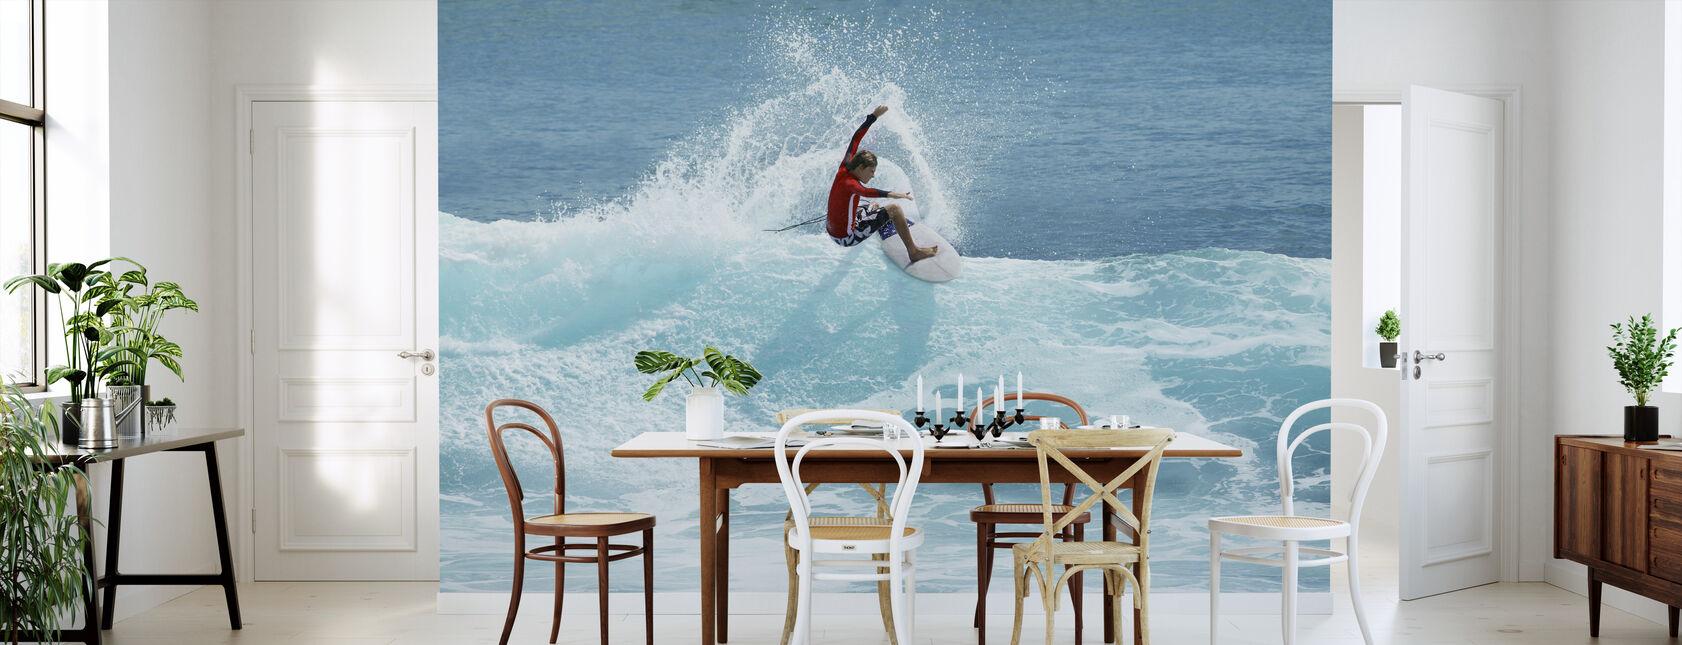 Surfer Carving Top van Wave - Behang - Keuken